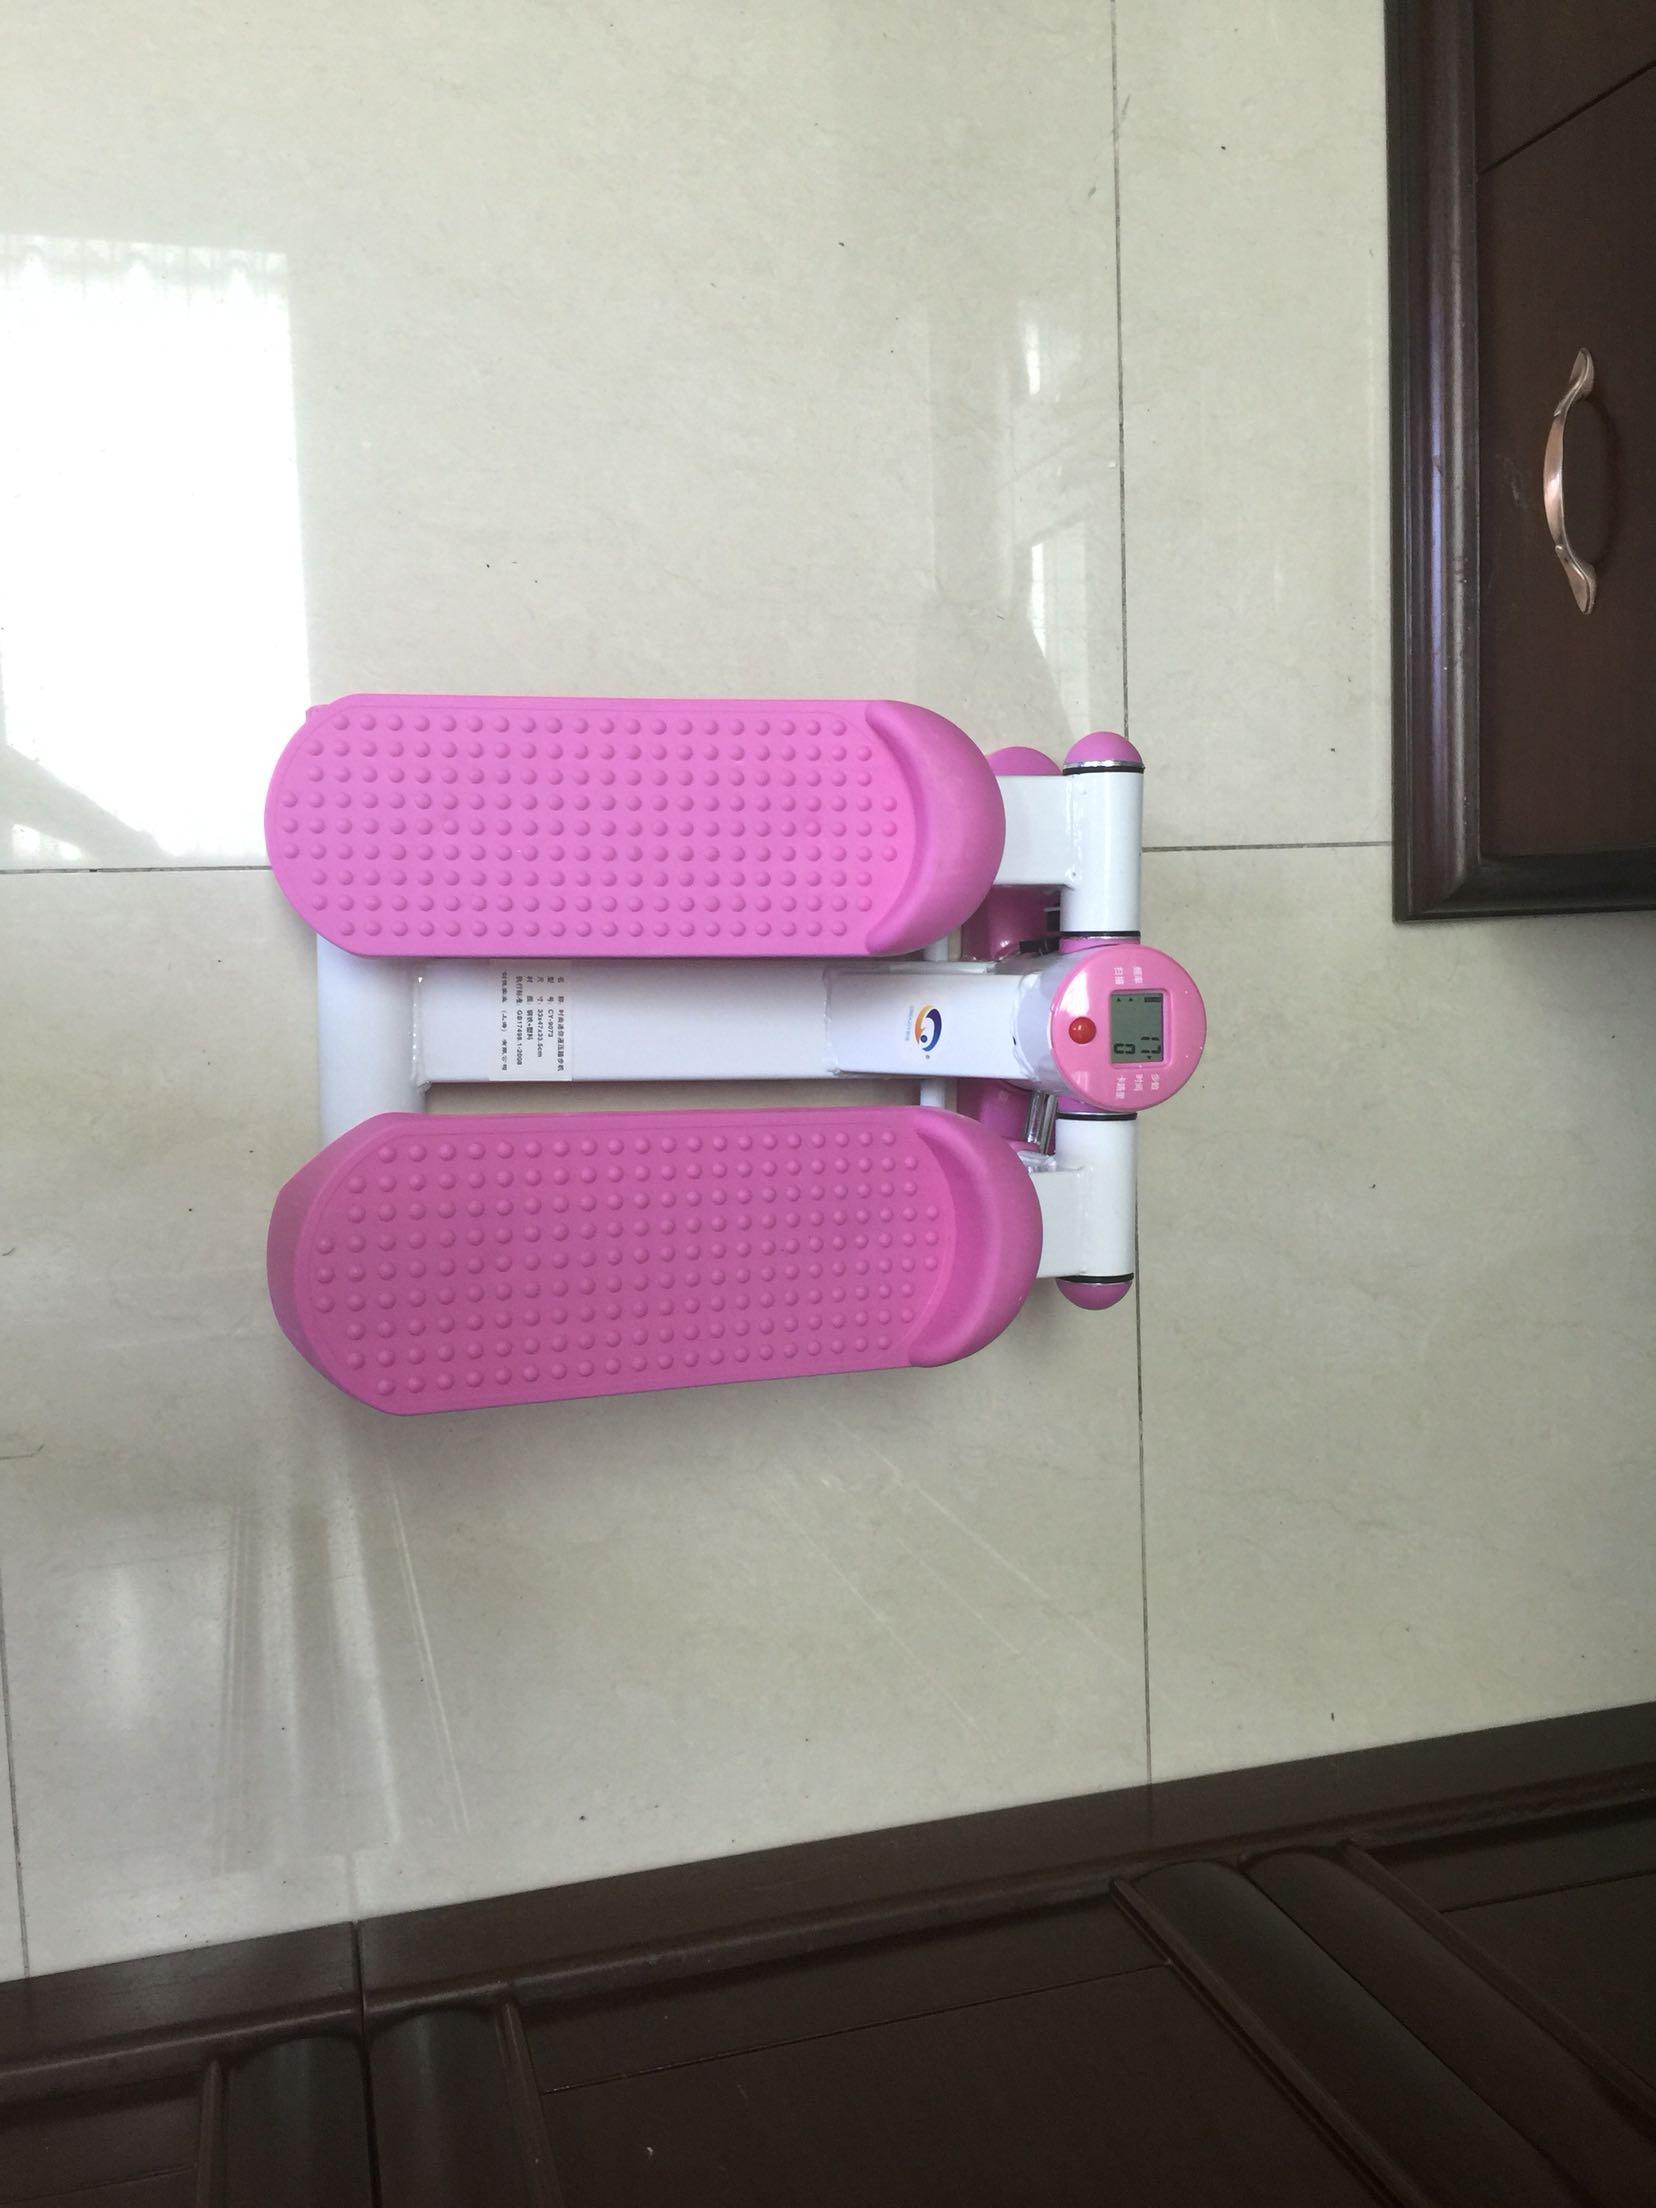 nike footwear abbreviations 00286229 real